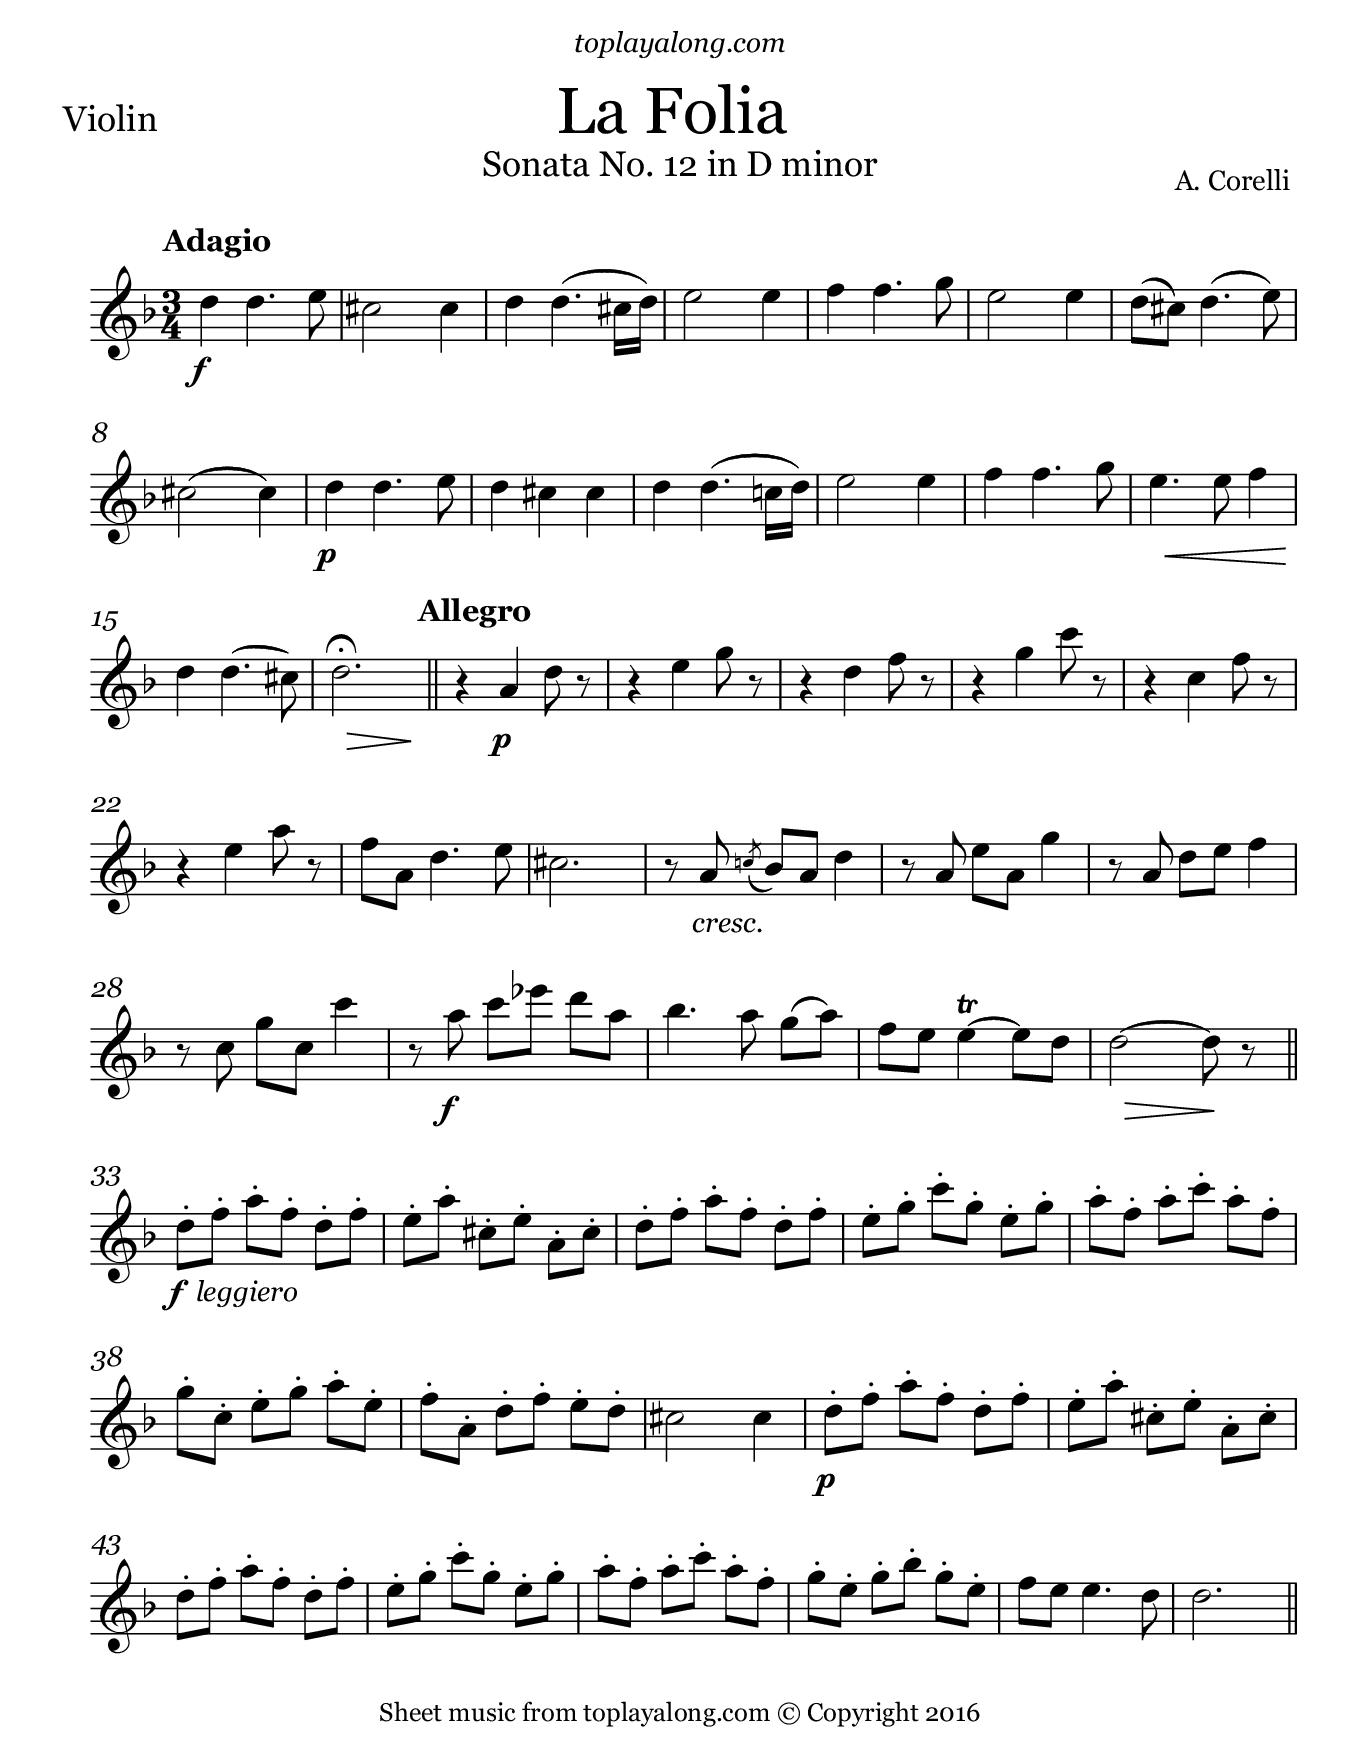 La Folia by Corelli  Free sheet music for violin  Visit toplayalong